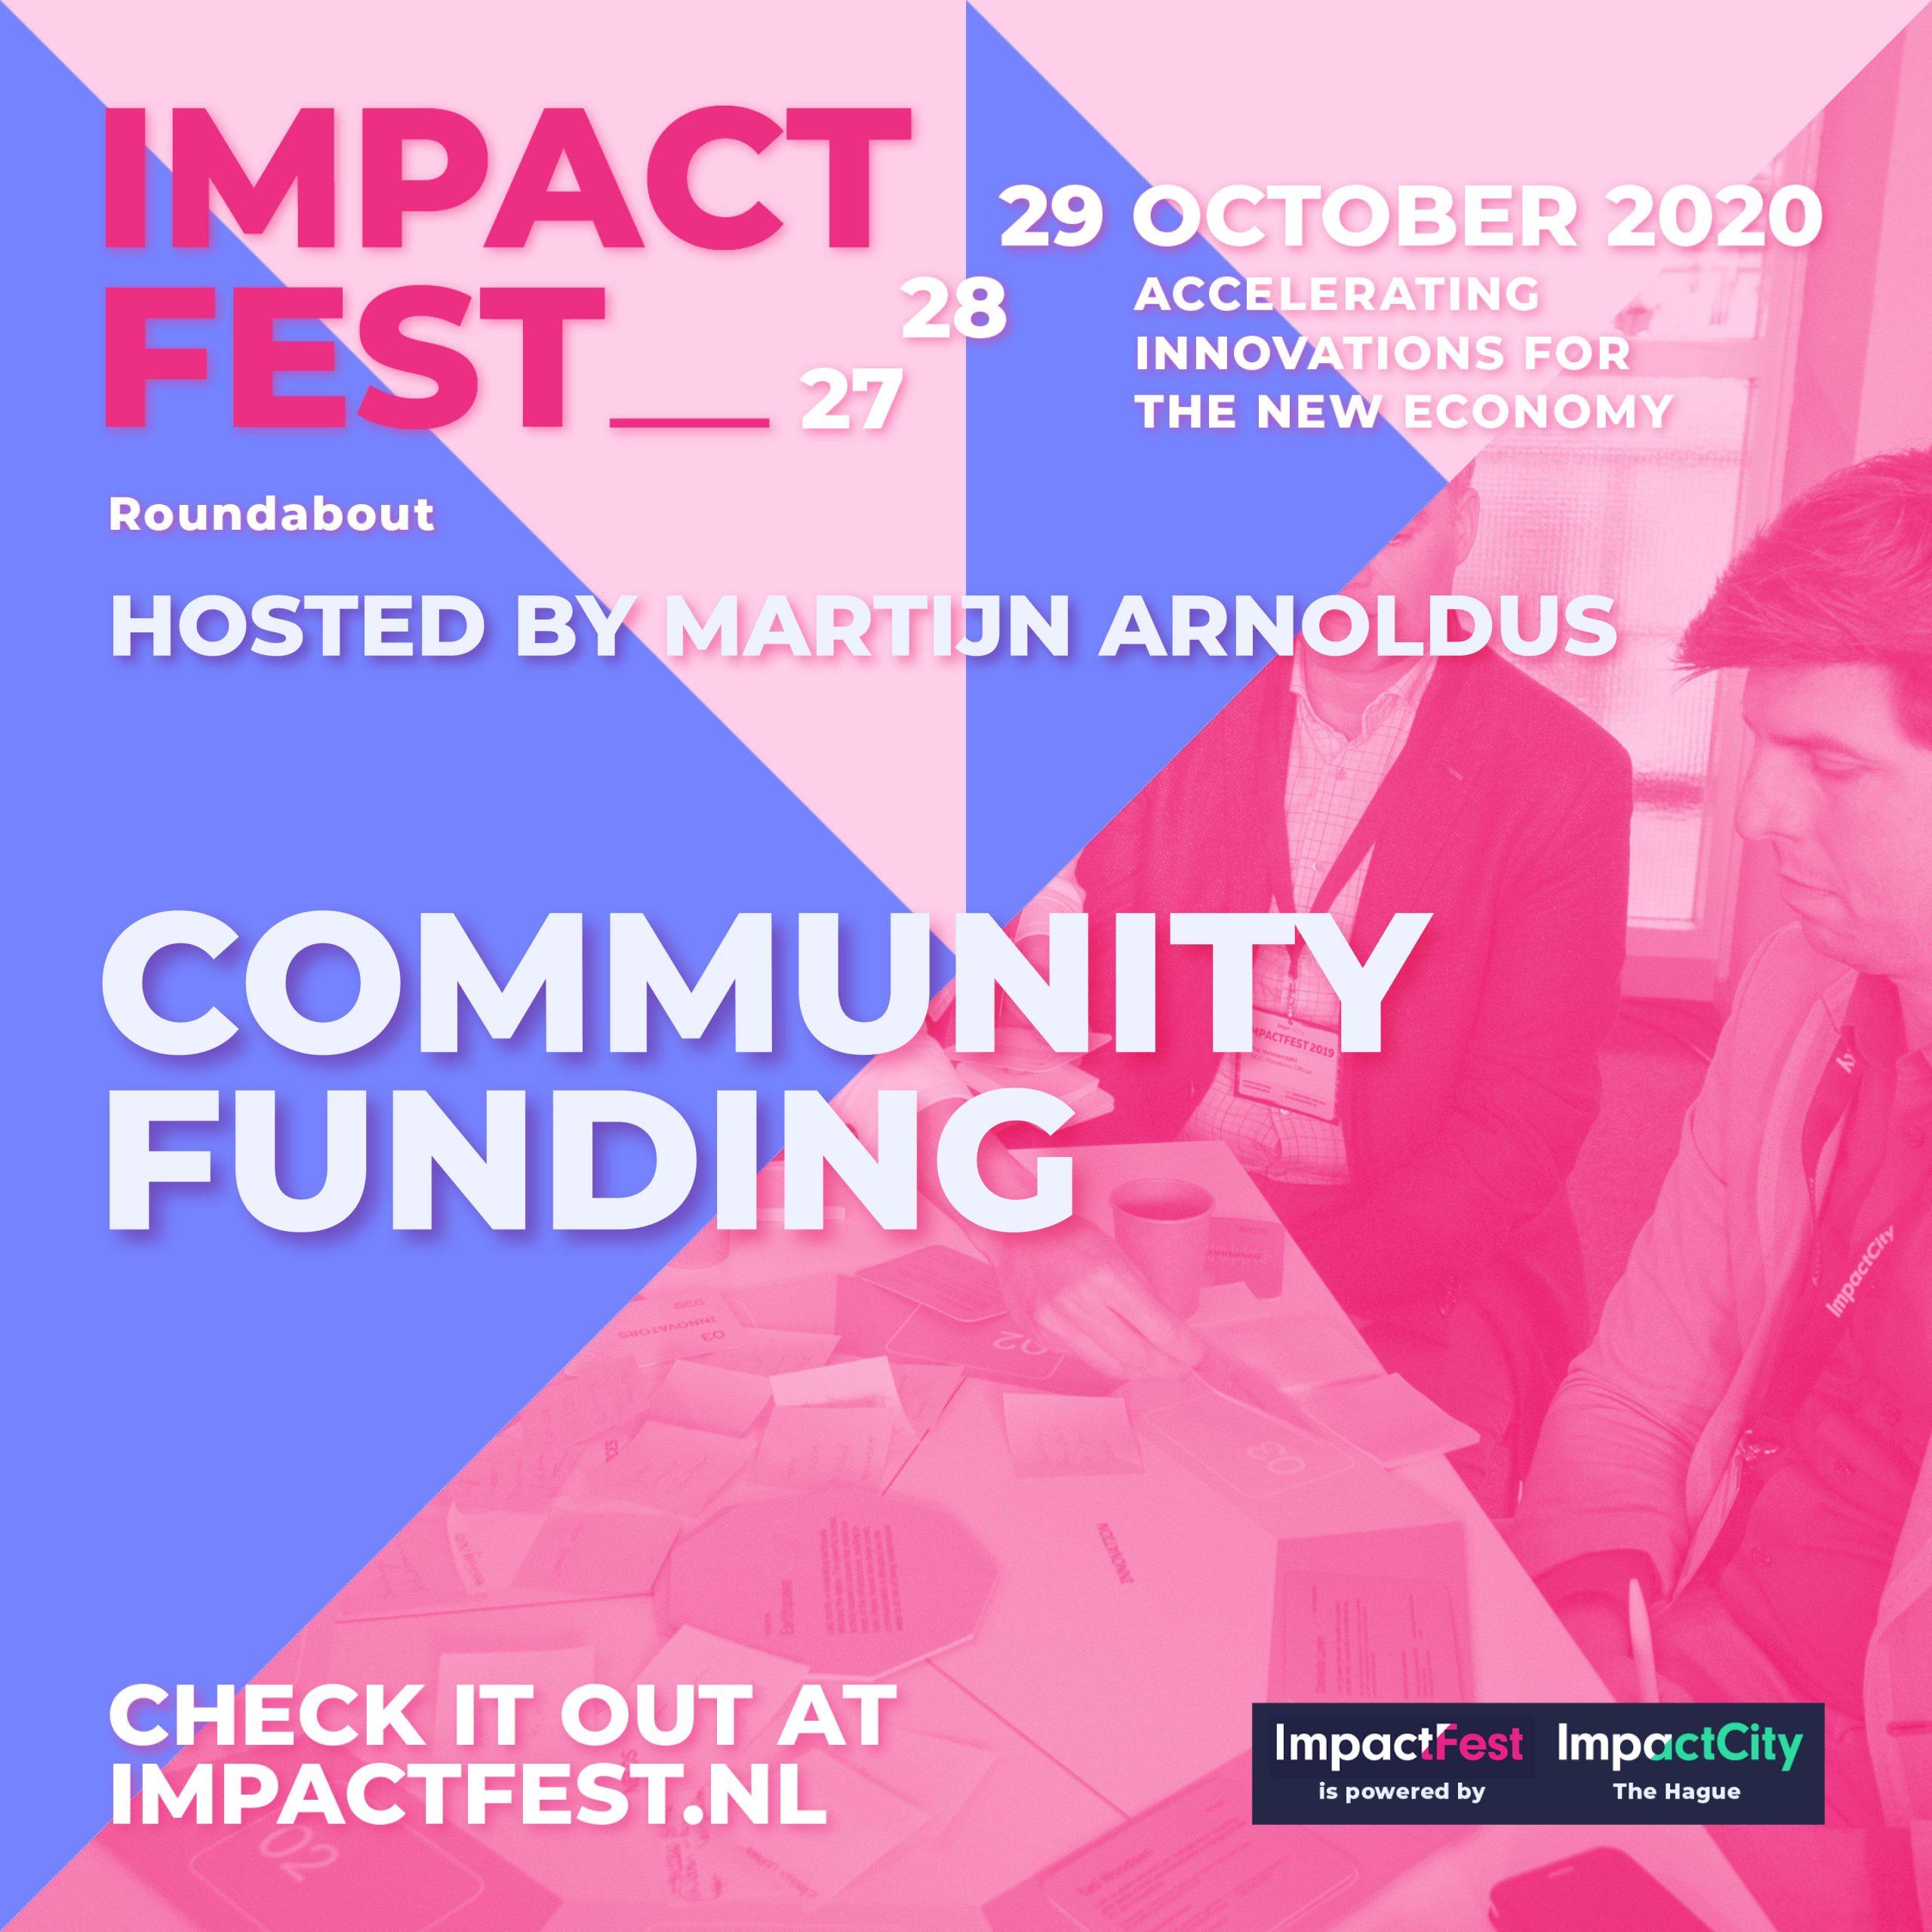 Community Funding at ImpactFest 2020